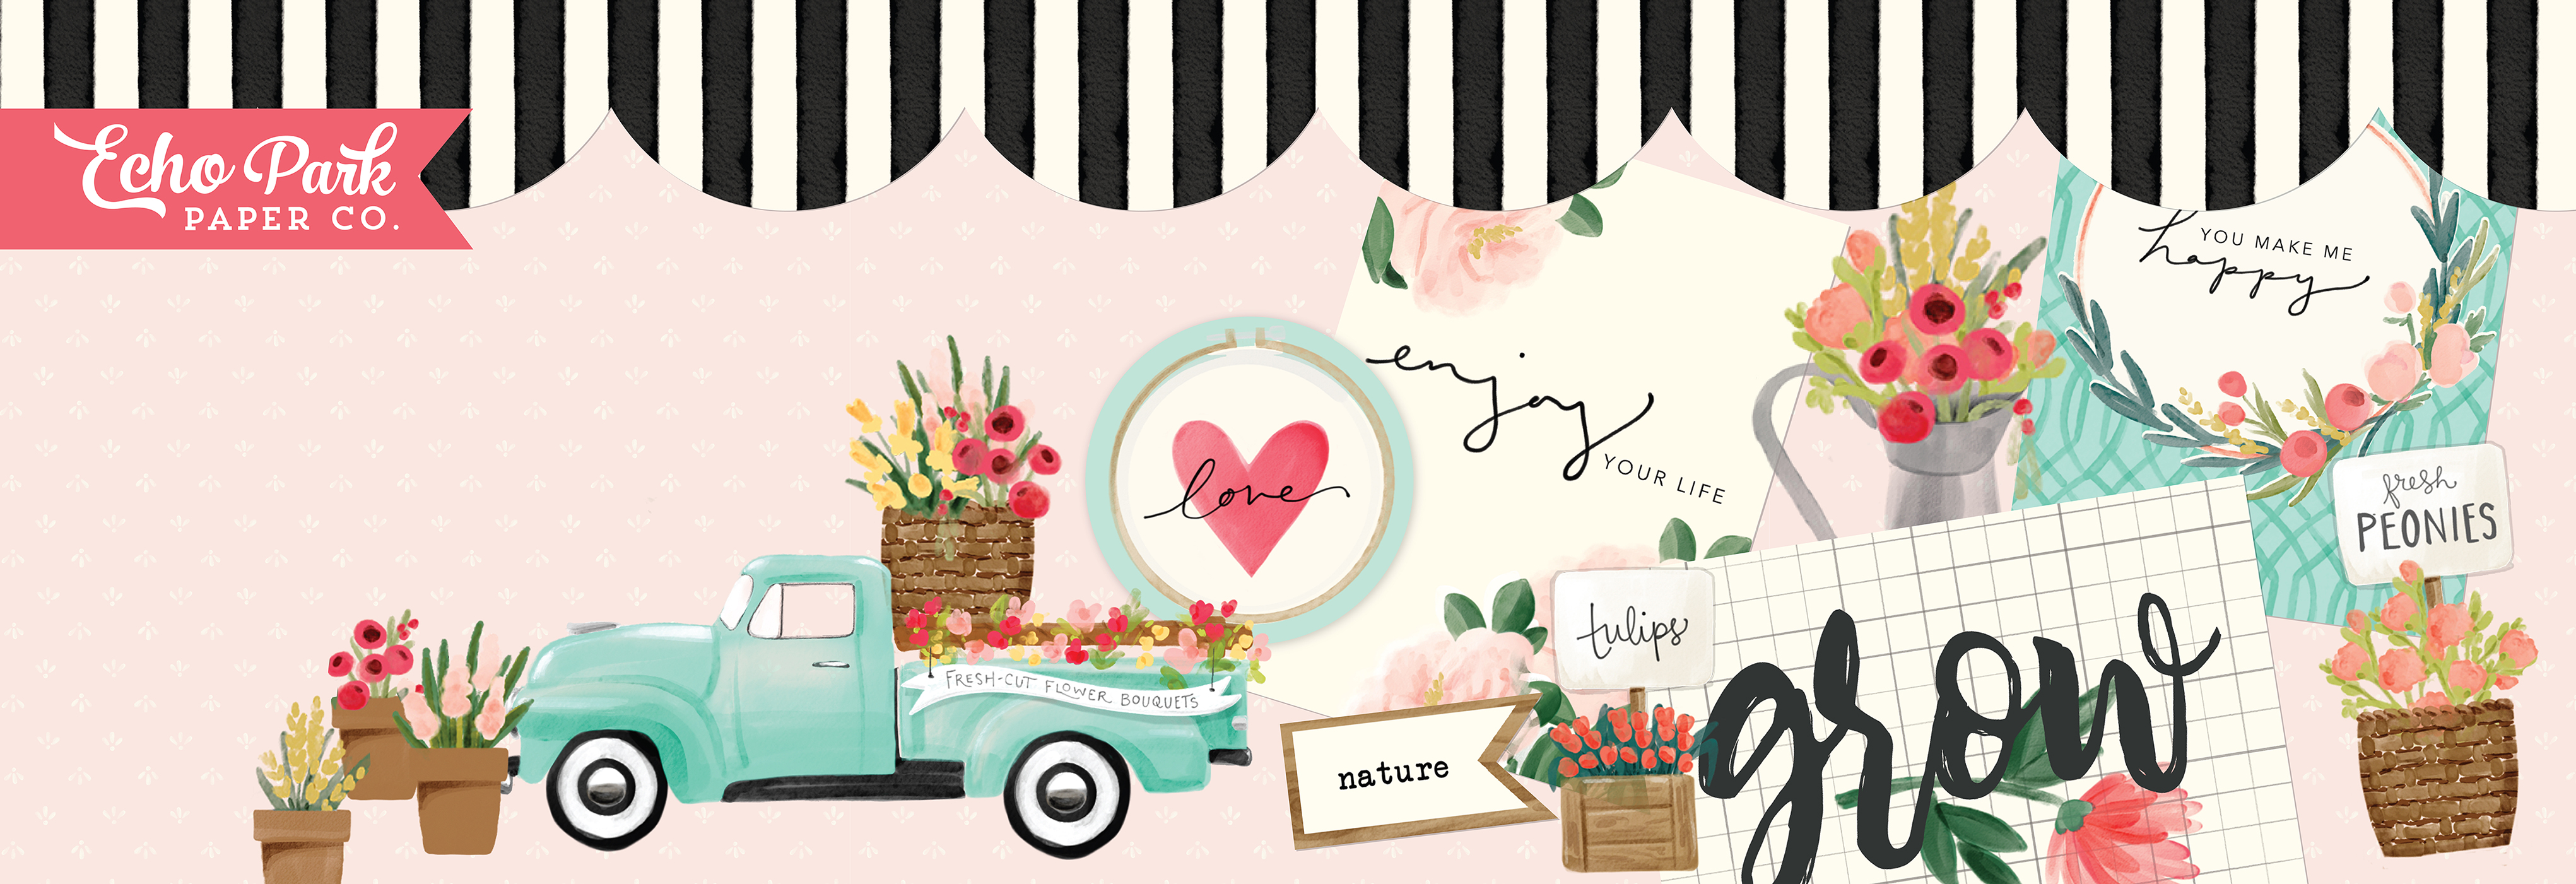 ep-flower-market-snap-click-banner-4083.jpg